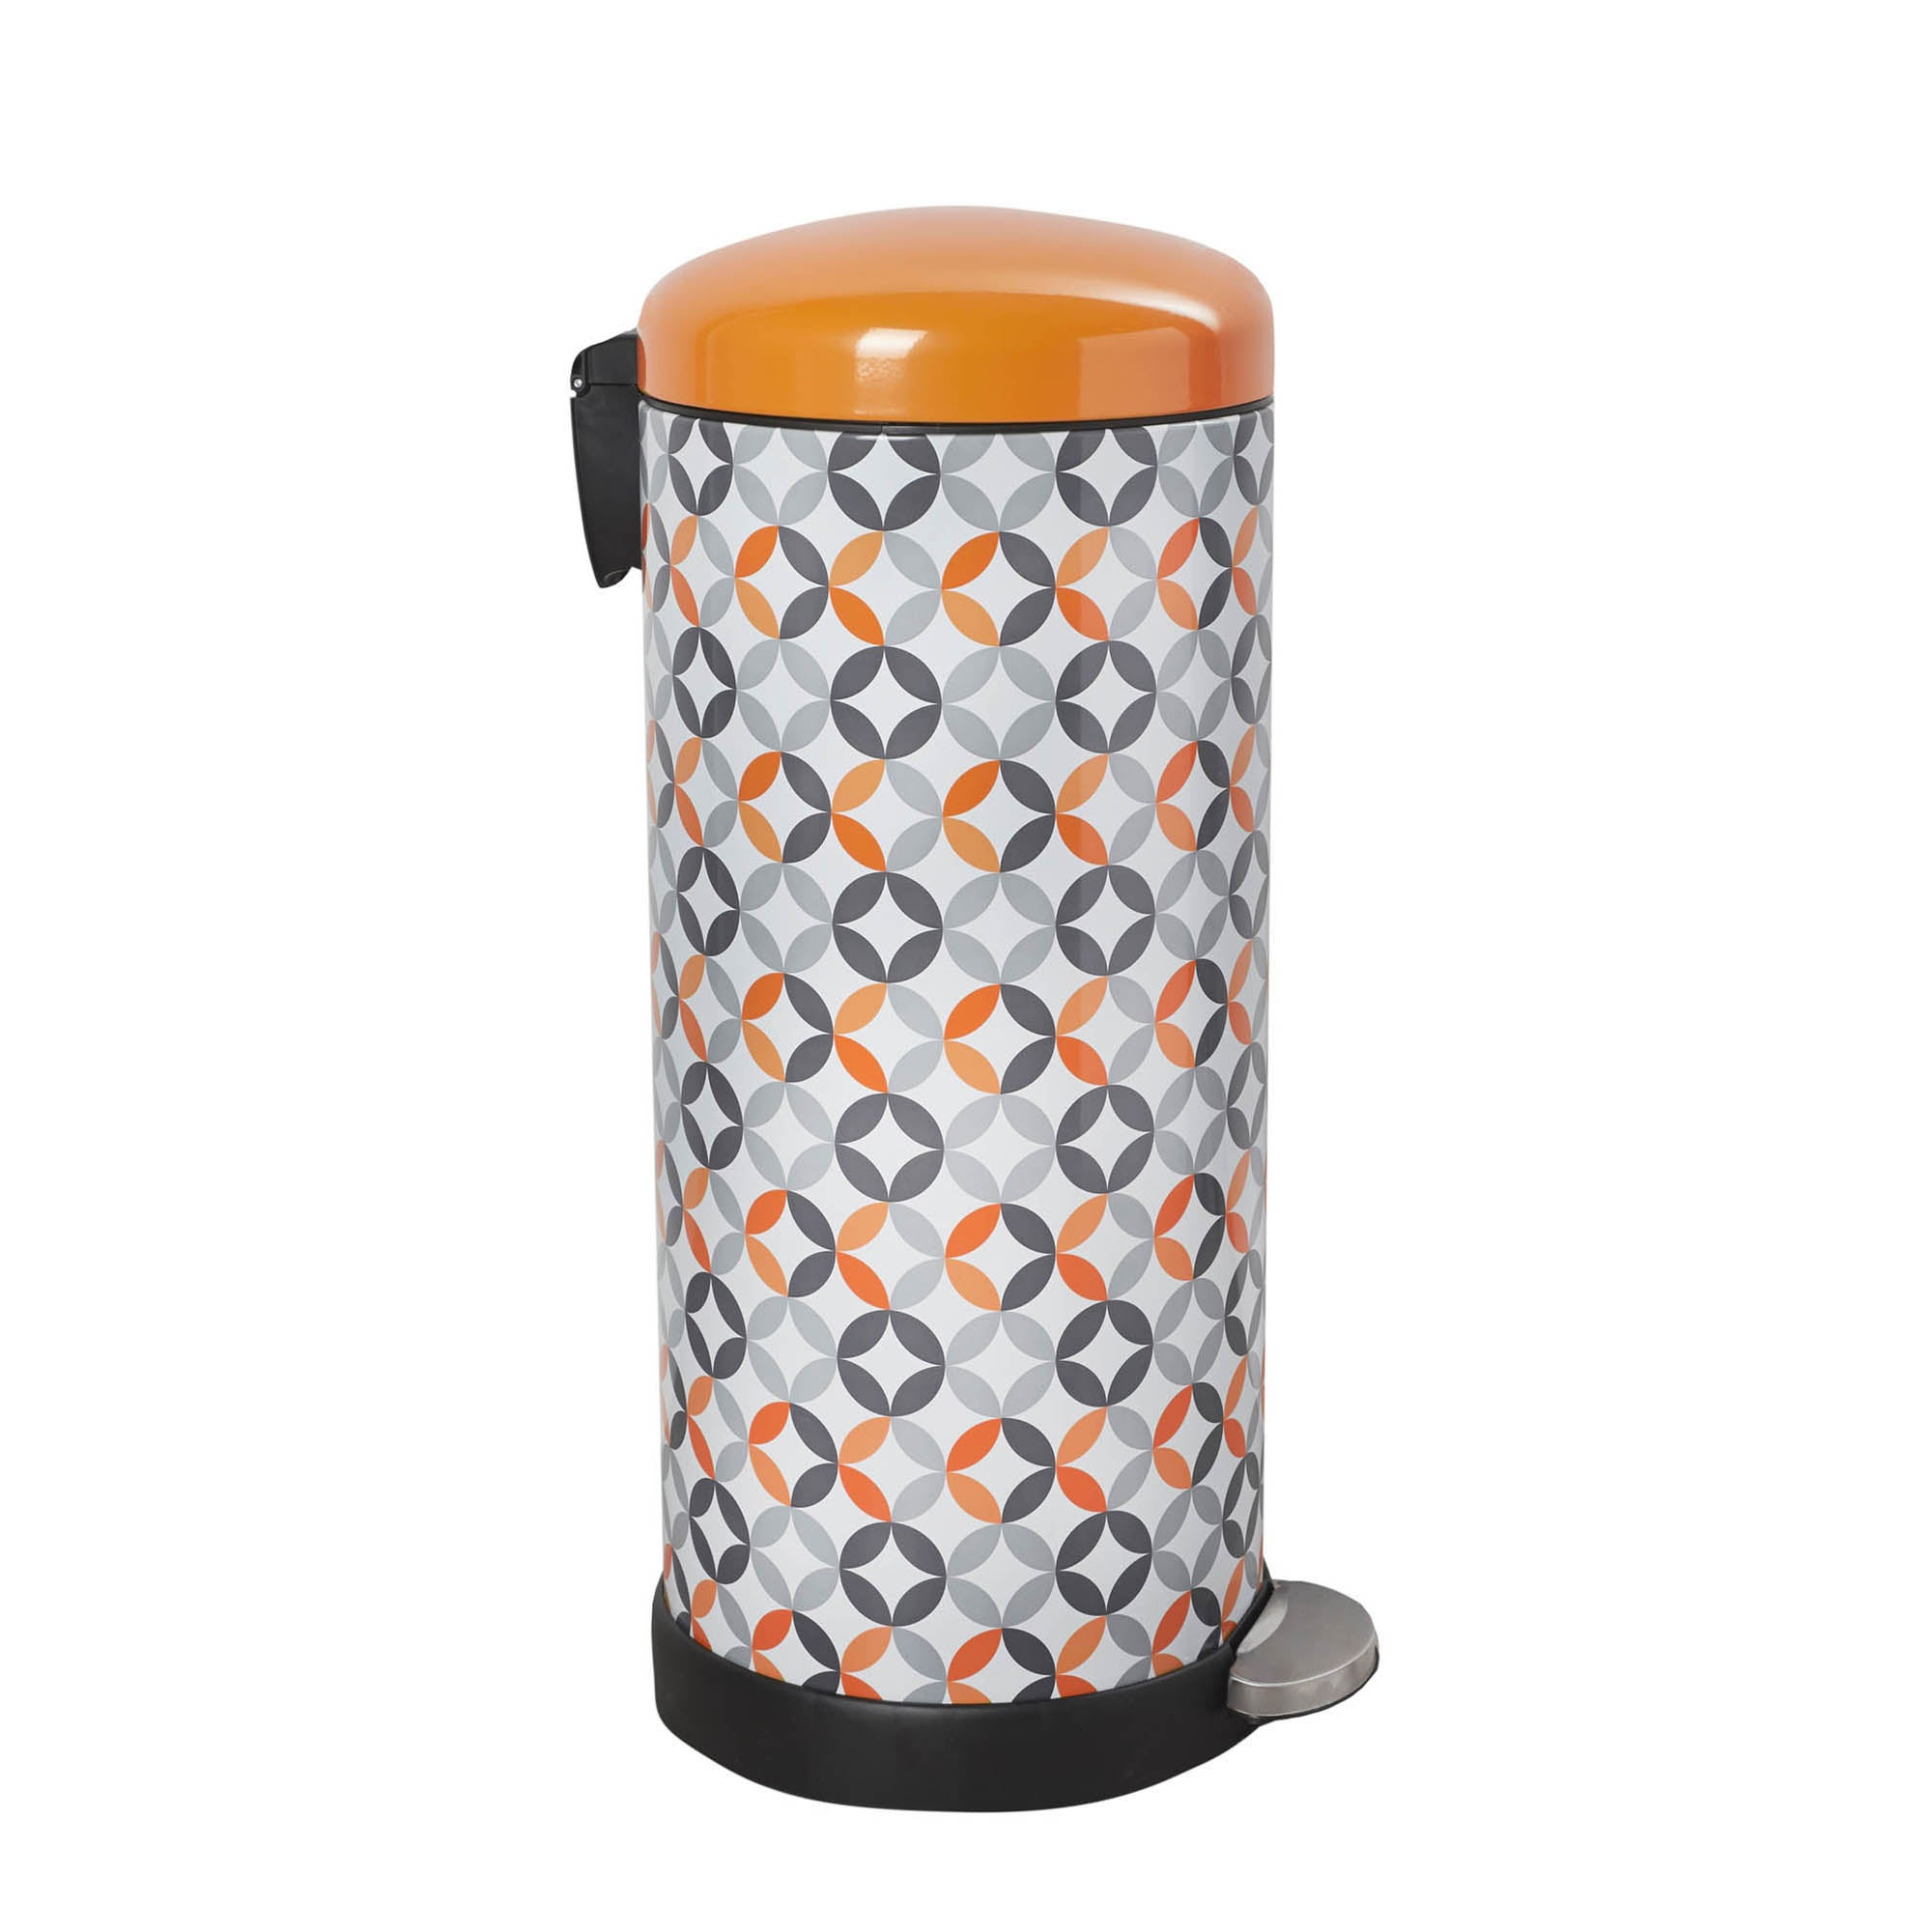 Photo of Dunelm 30 litre retro print stainless steel pedal bin orange